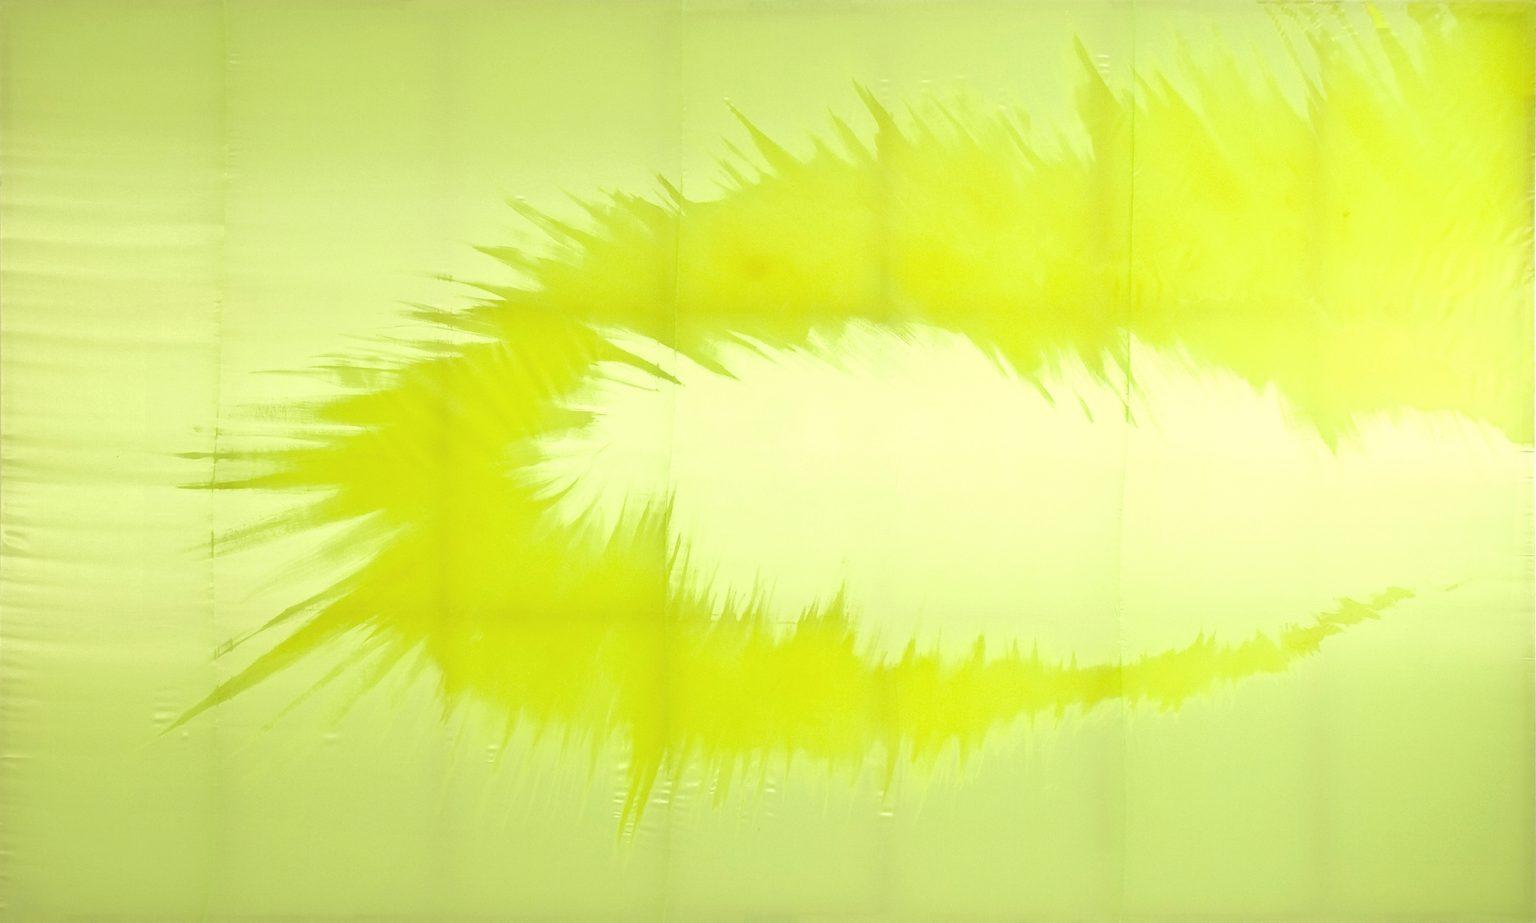 Daniel Lergon, ohne Titel, 2008, Lack auf Stoff, 300 x 500 cm